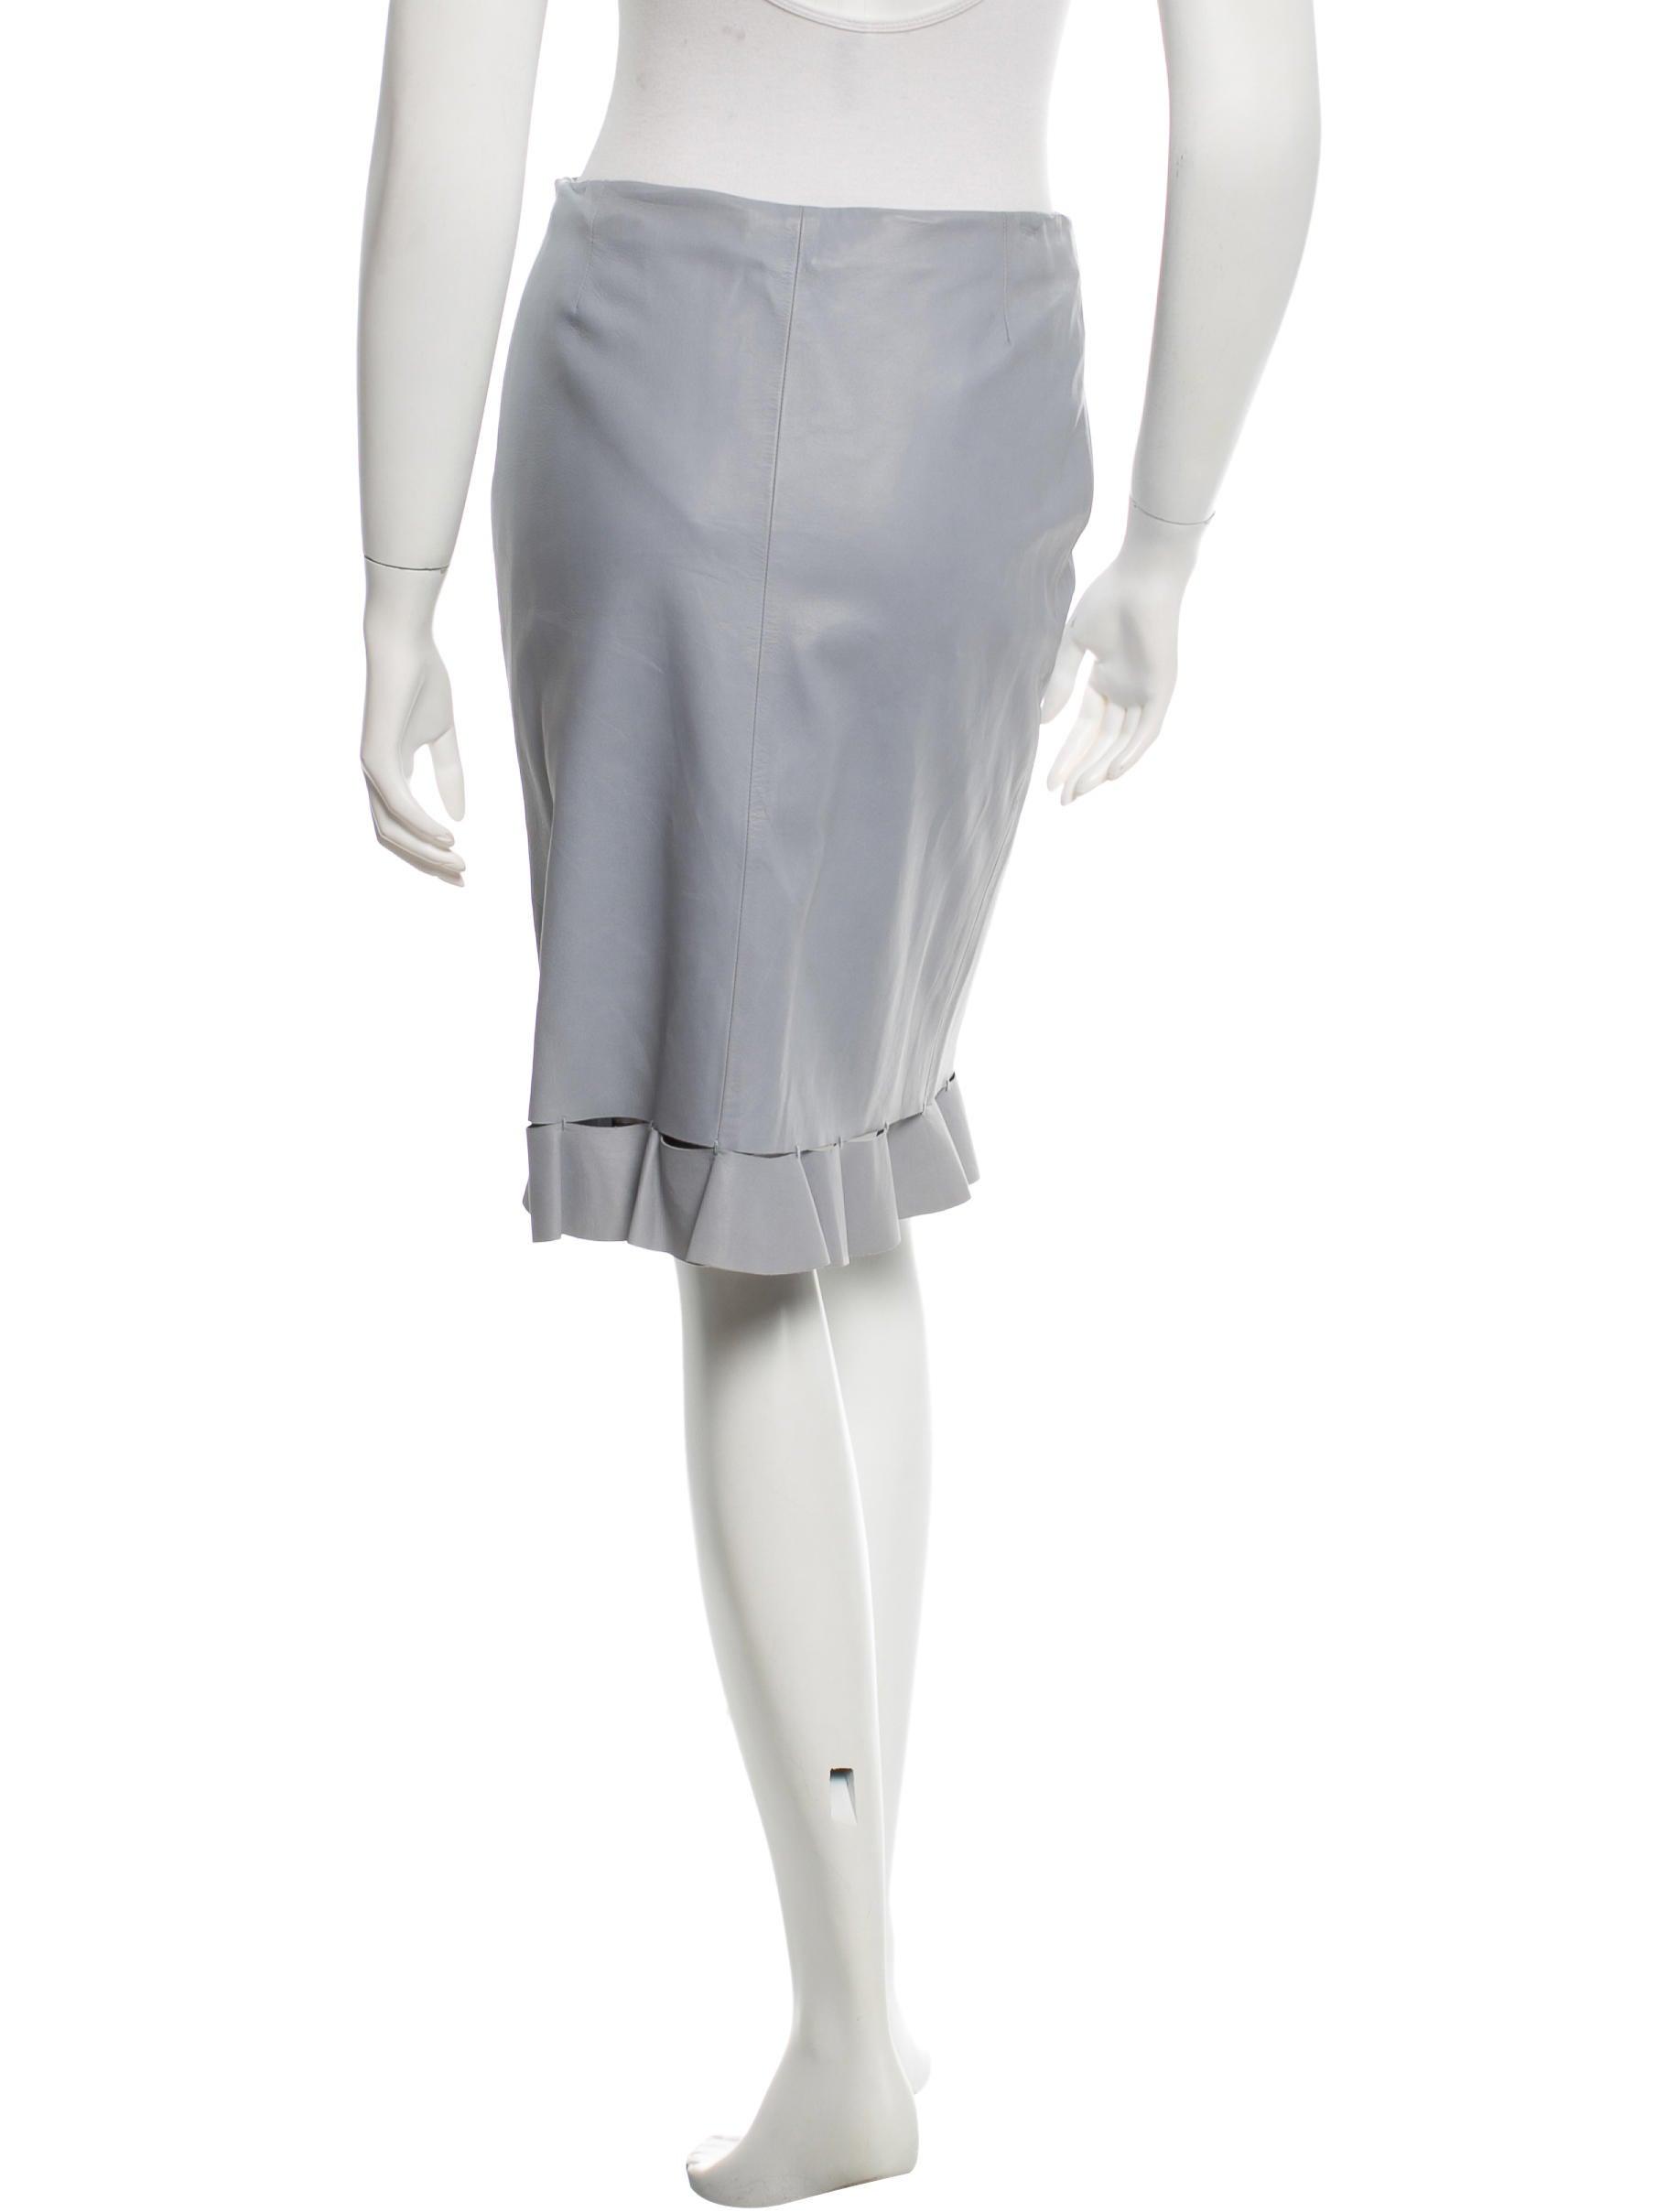 prada leather ruffle trimmed skirt clothing pra103264